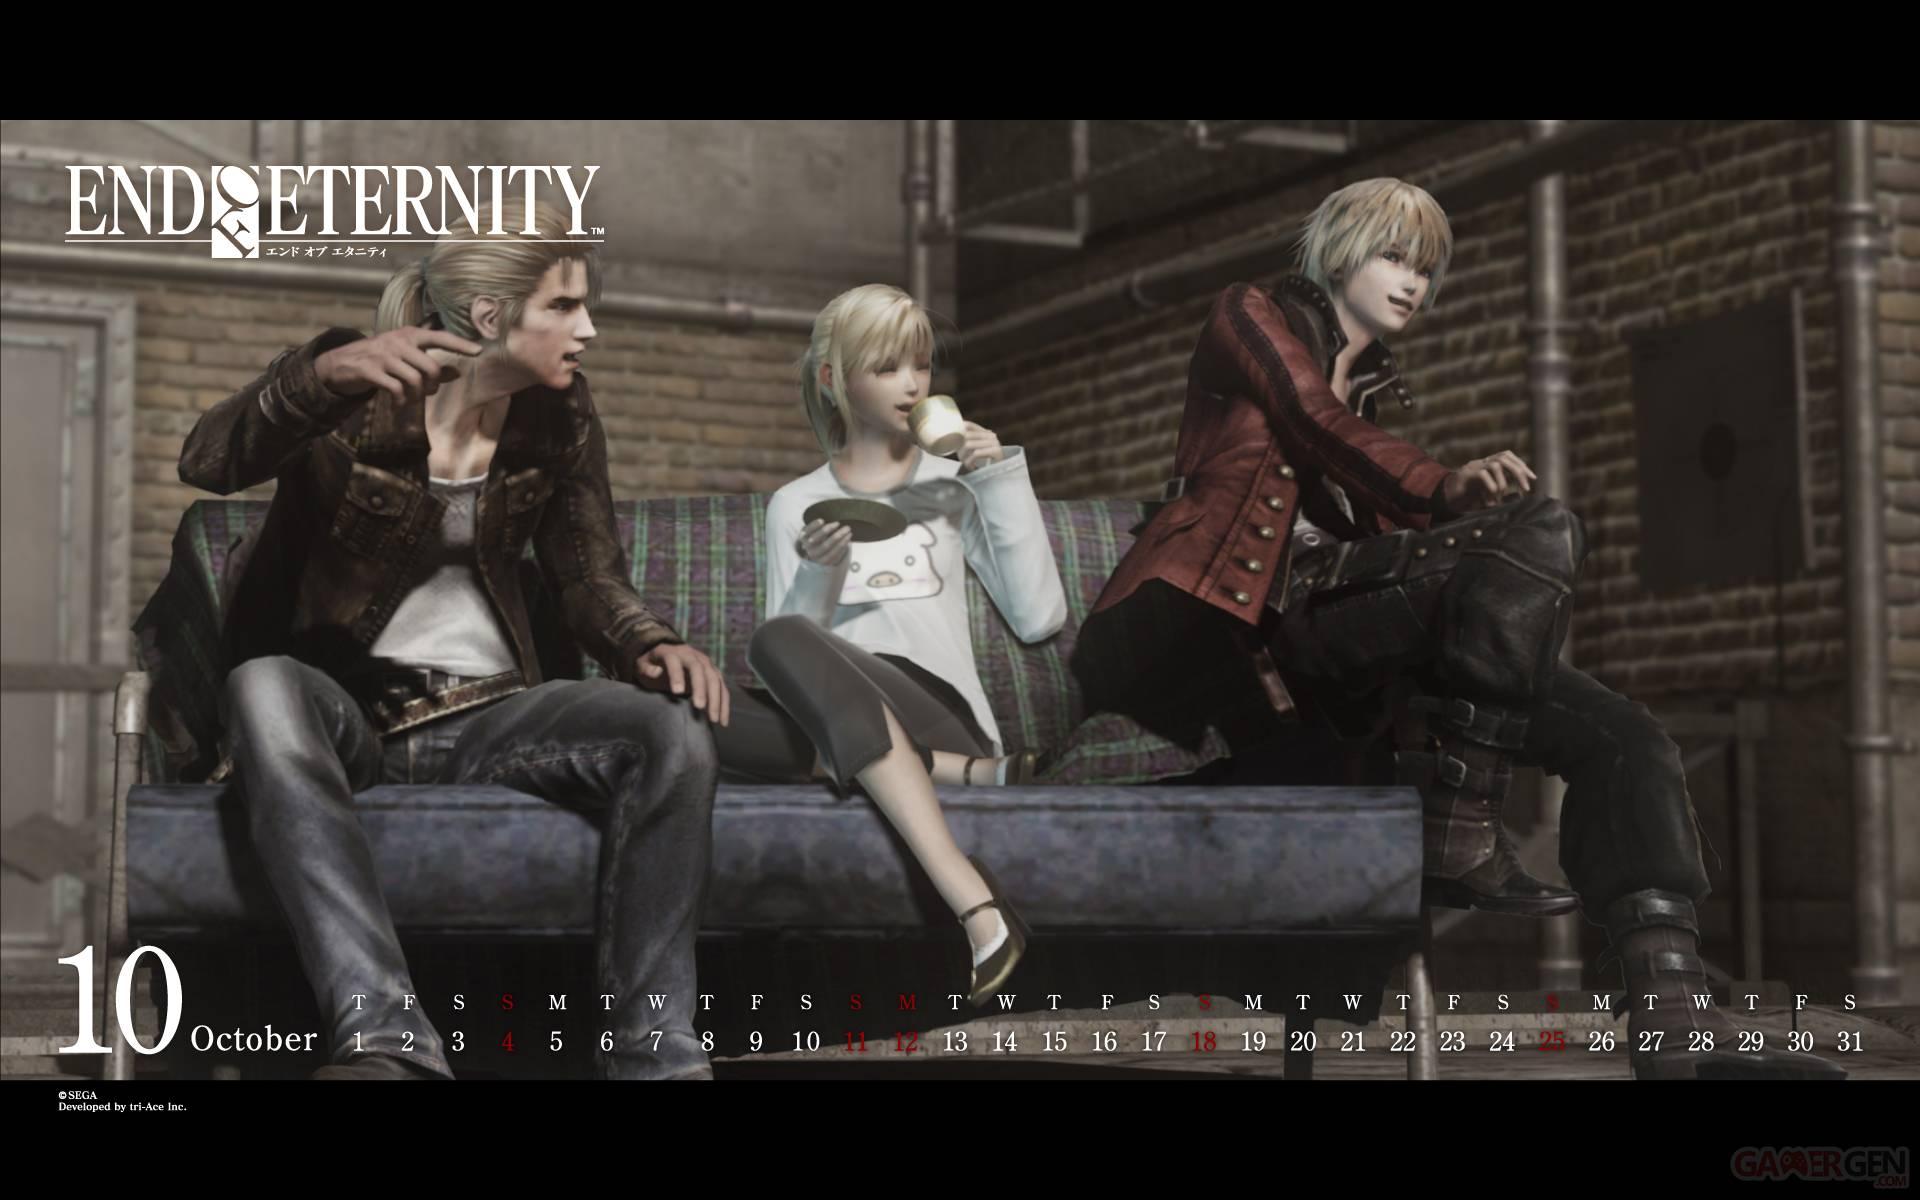 endofeternity_01